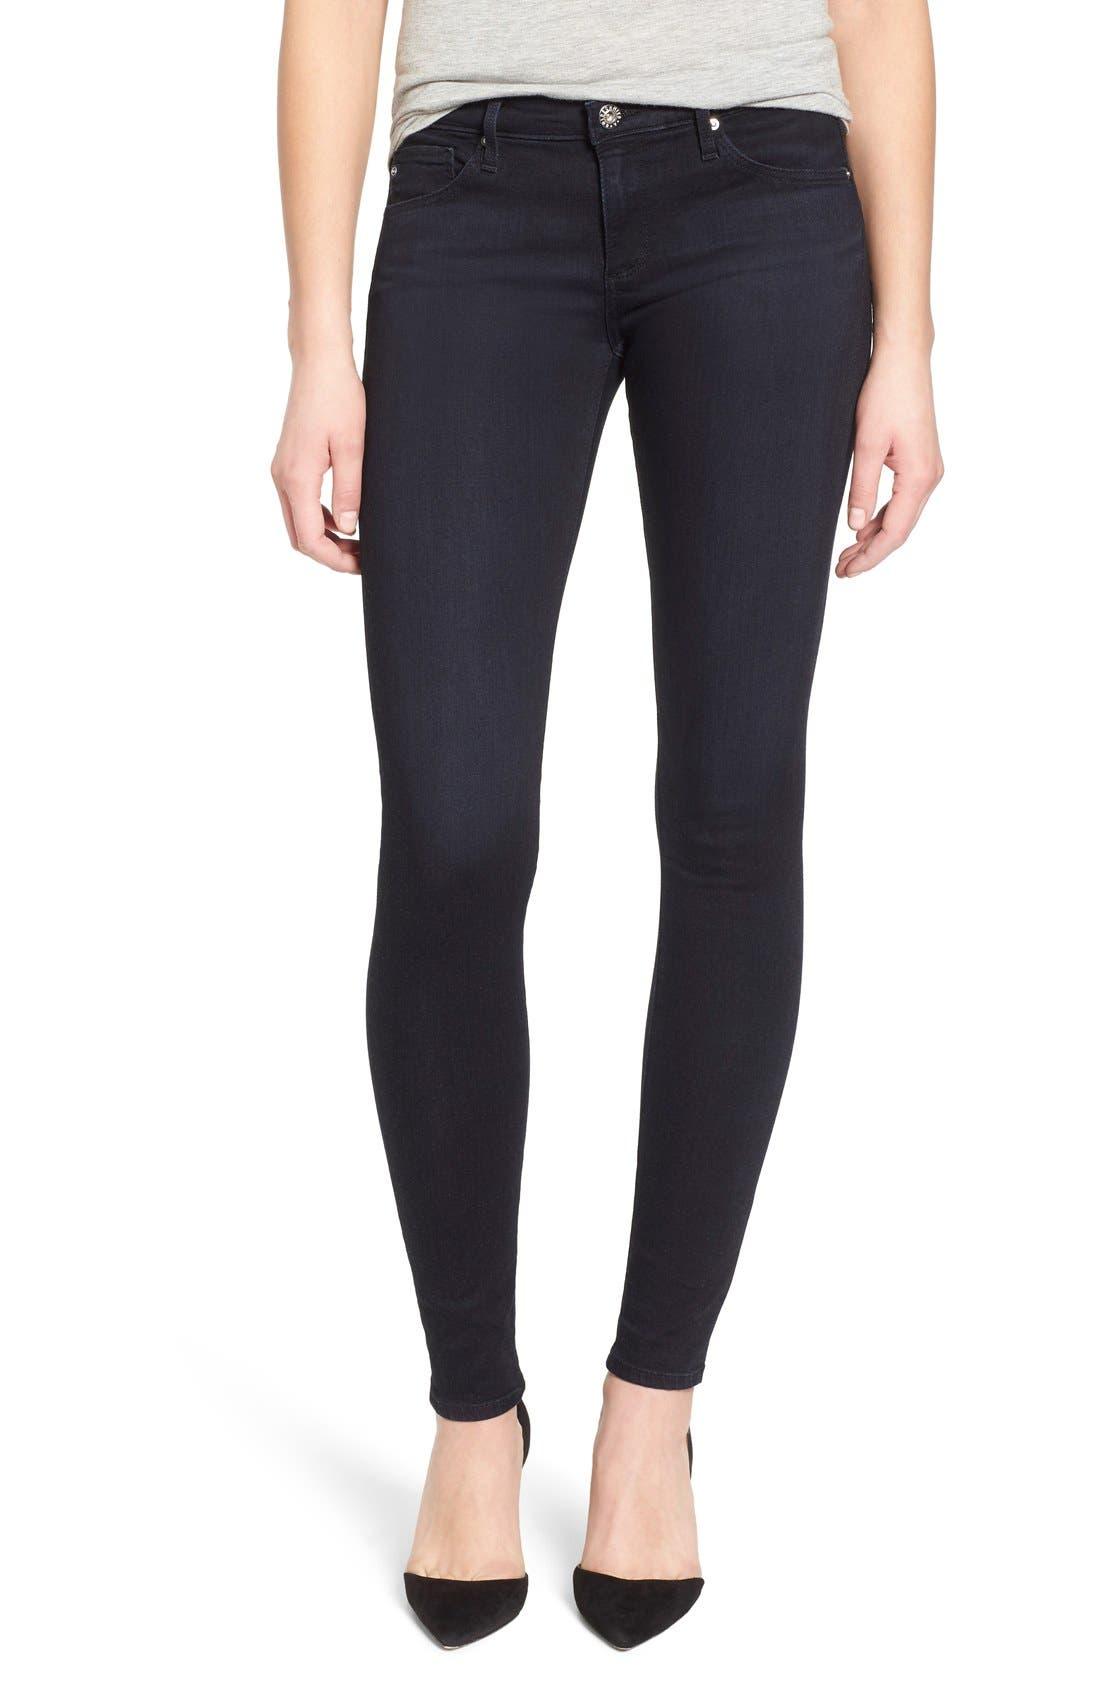 Main Image - AG 'The Legging' Super Skinny Jeans (Shade)